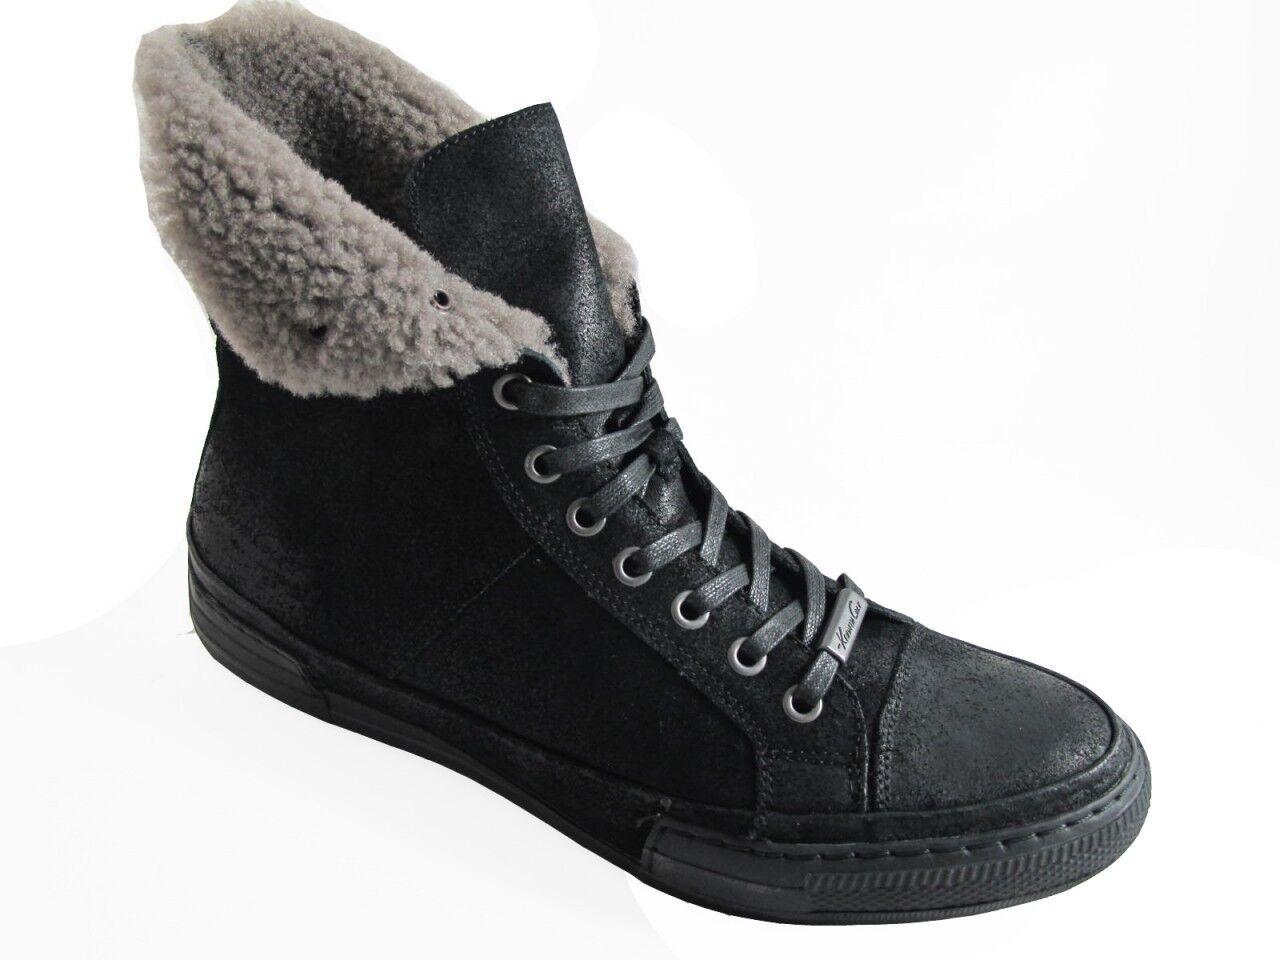 Kenneth Kole  Men's Leap Year Fashion Sneakers Laceup Hightop